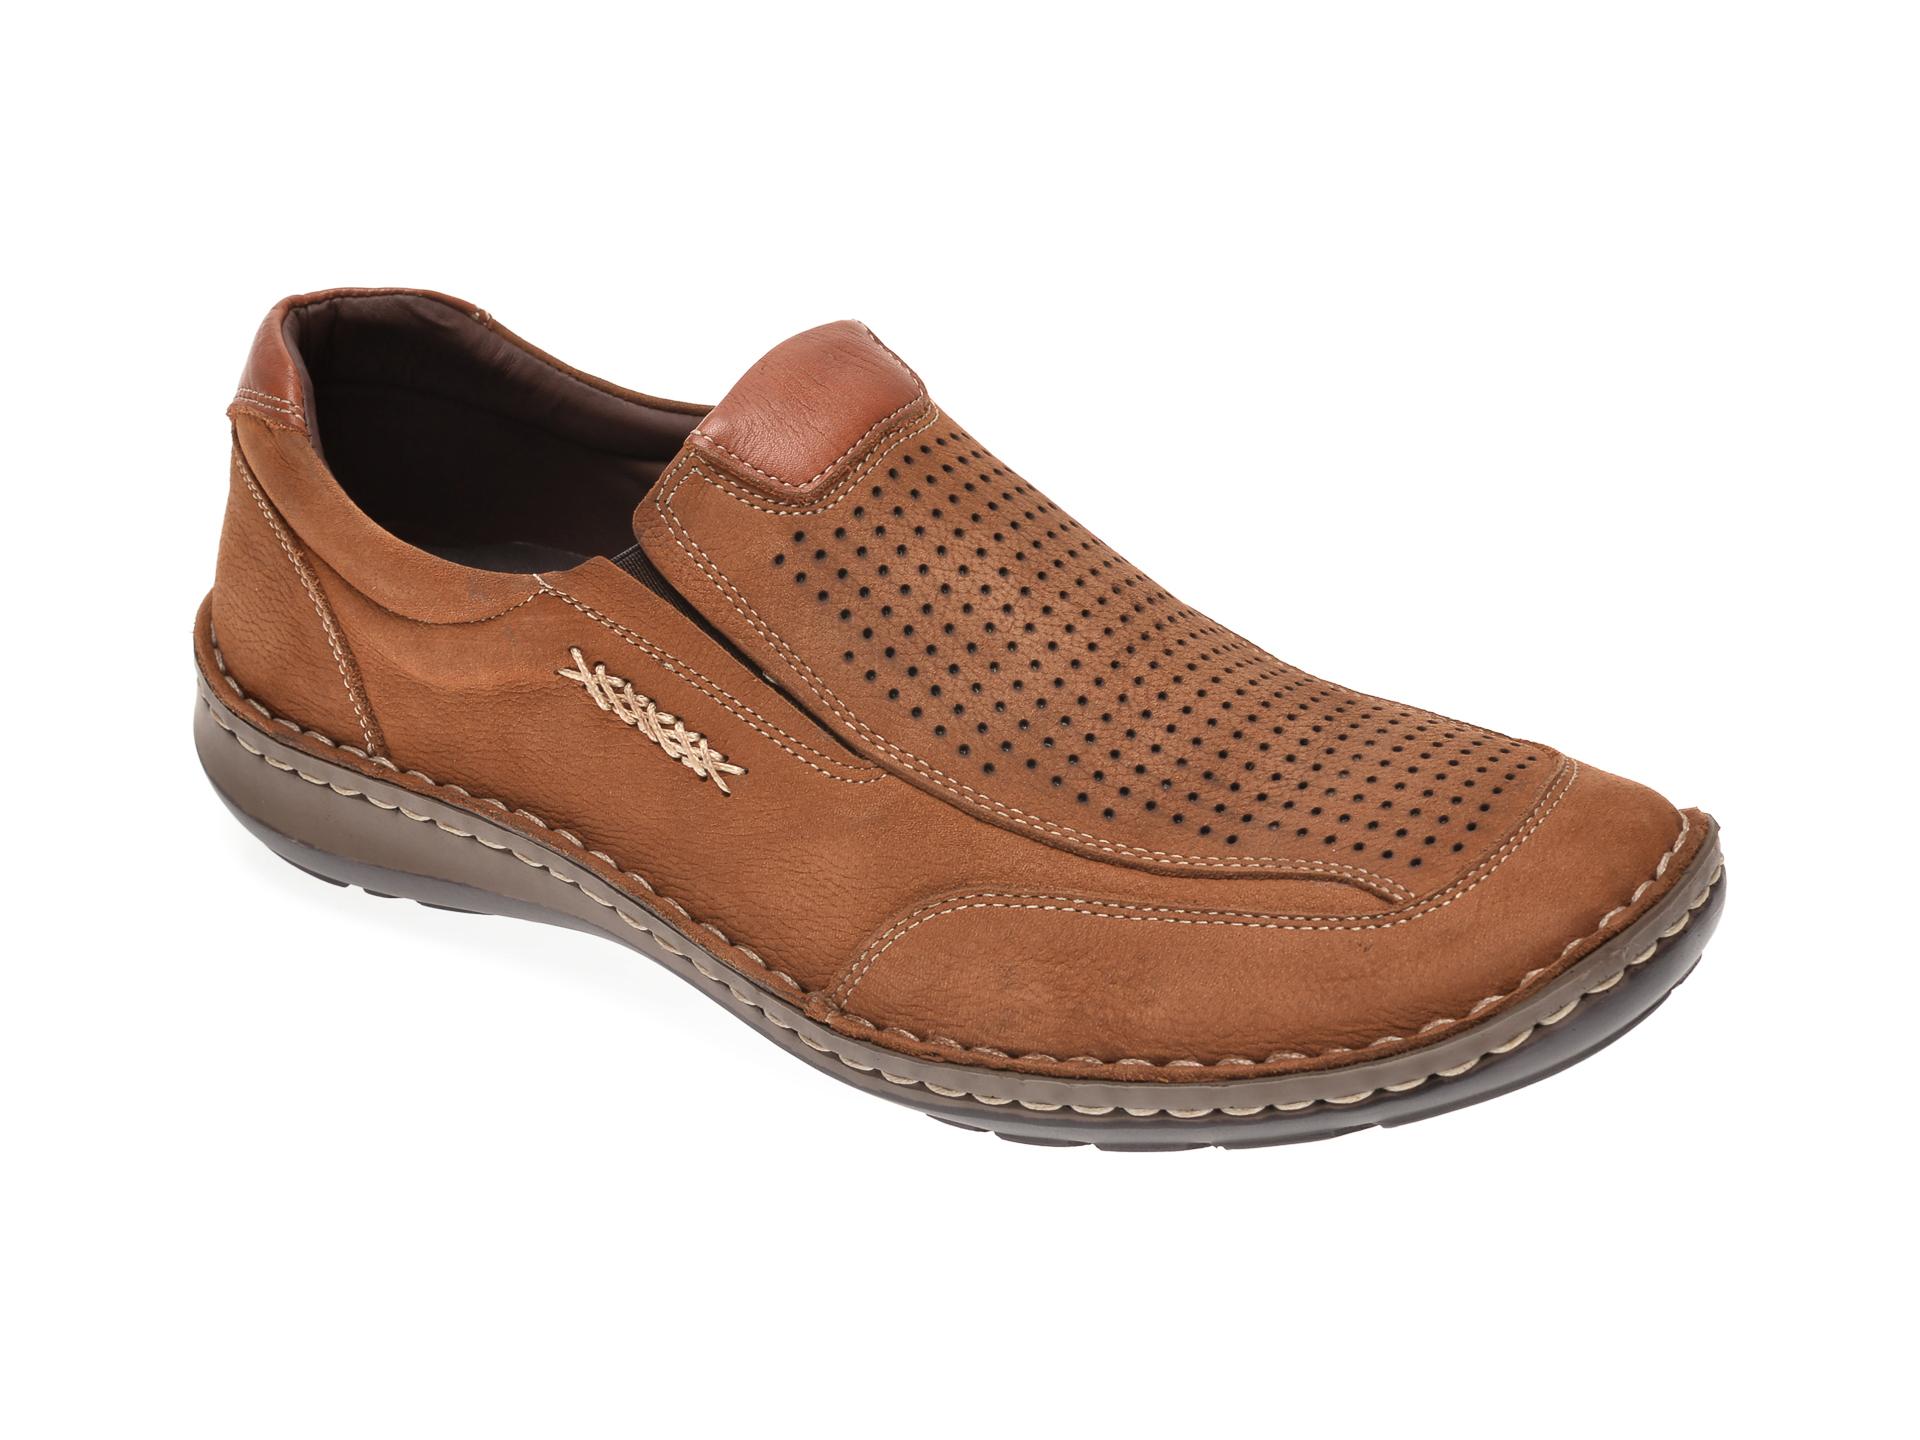 Pantofi OTTER maro, 9550, din piele intoarsa imagine